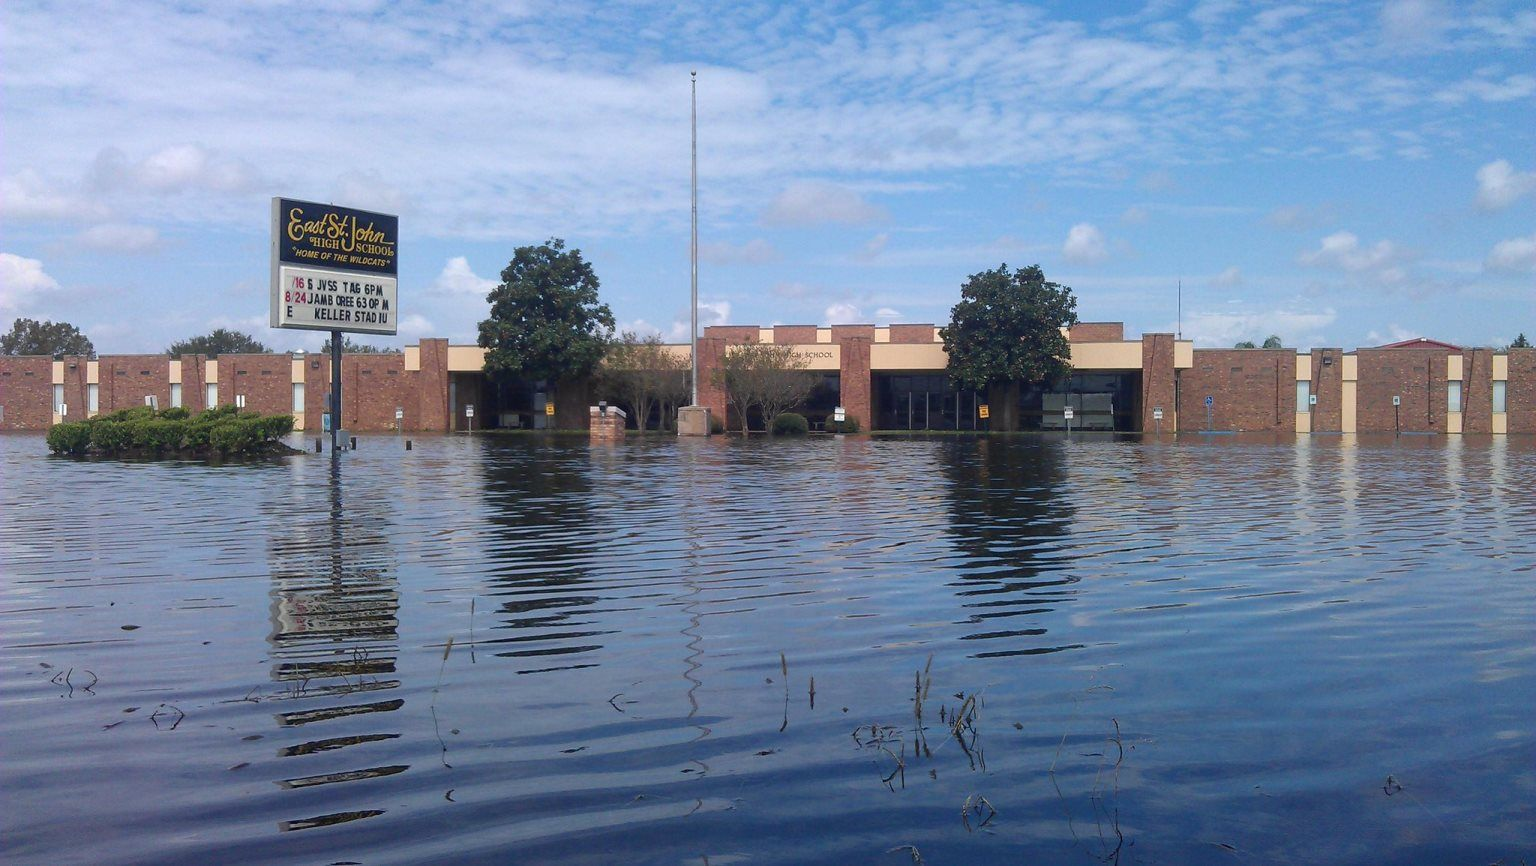 East St. John High School during flood